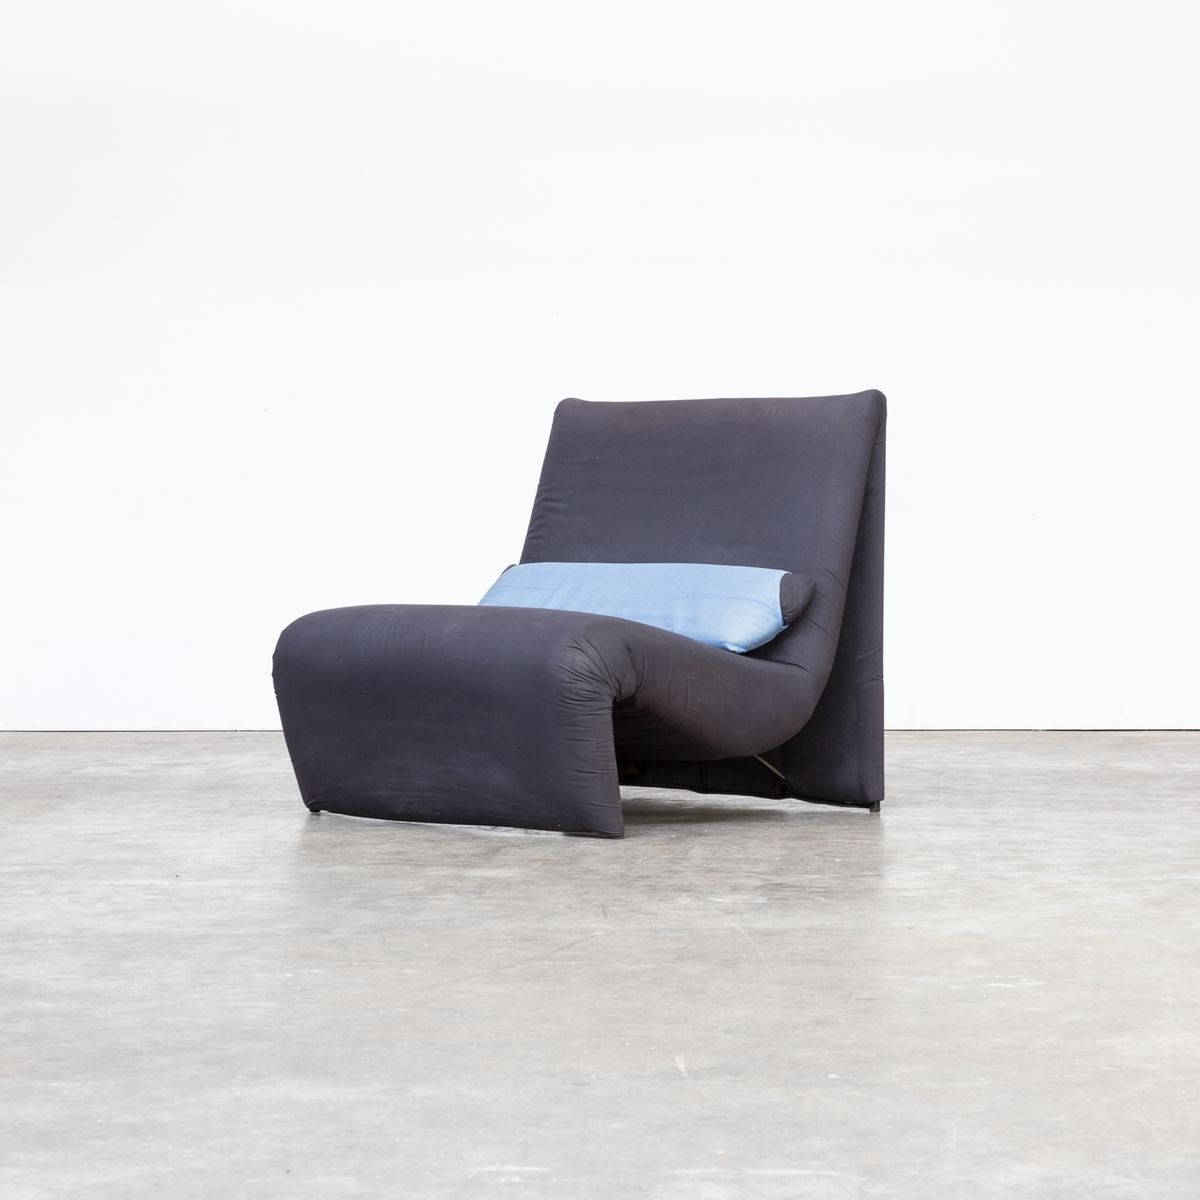 sessel von ligne roset 1980er bei pamono kaufen. Black Bedroom Furniture Sets. Home Design Ideas